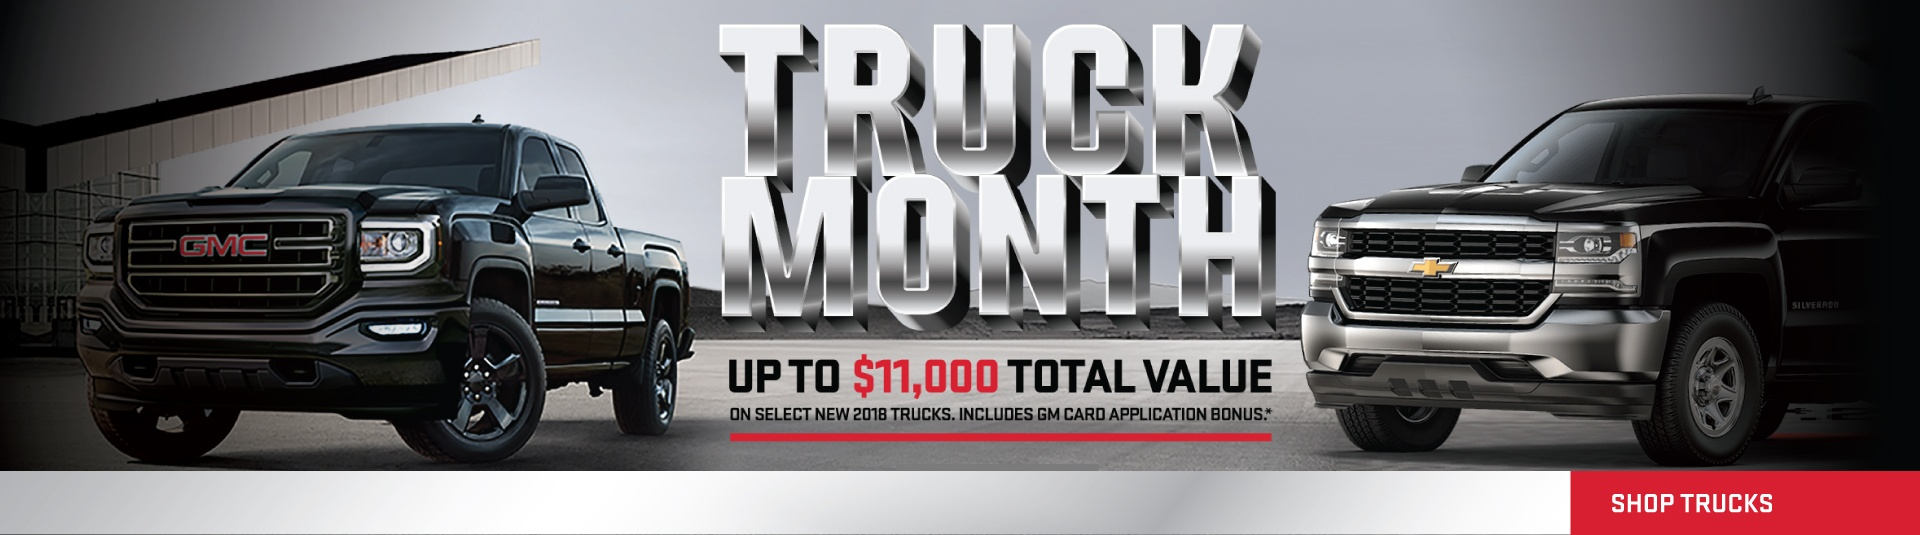 Truck Month Sale